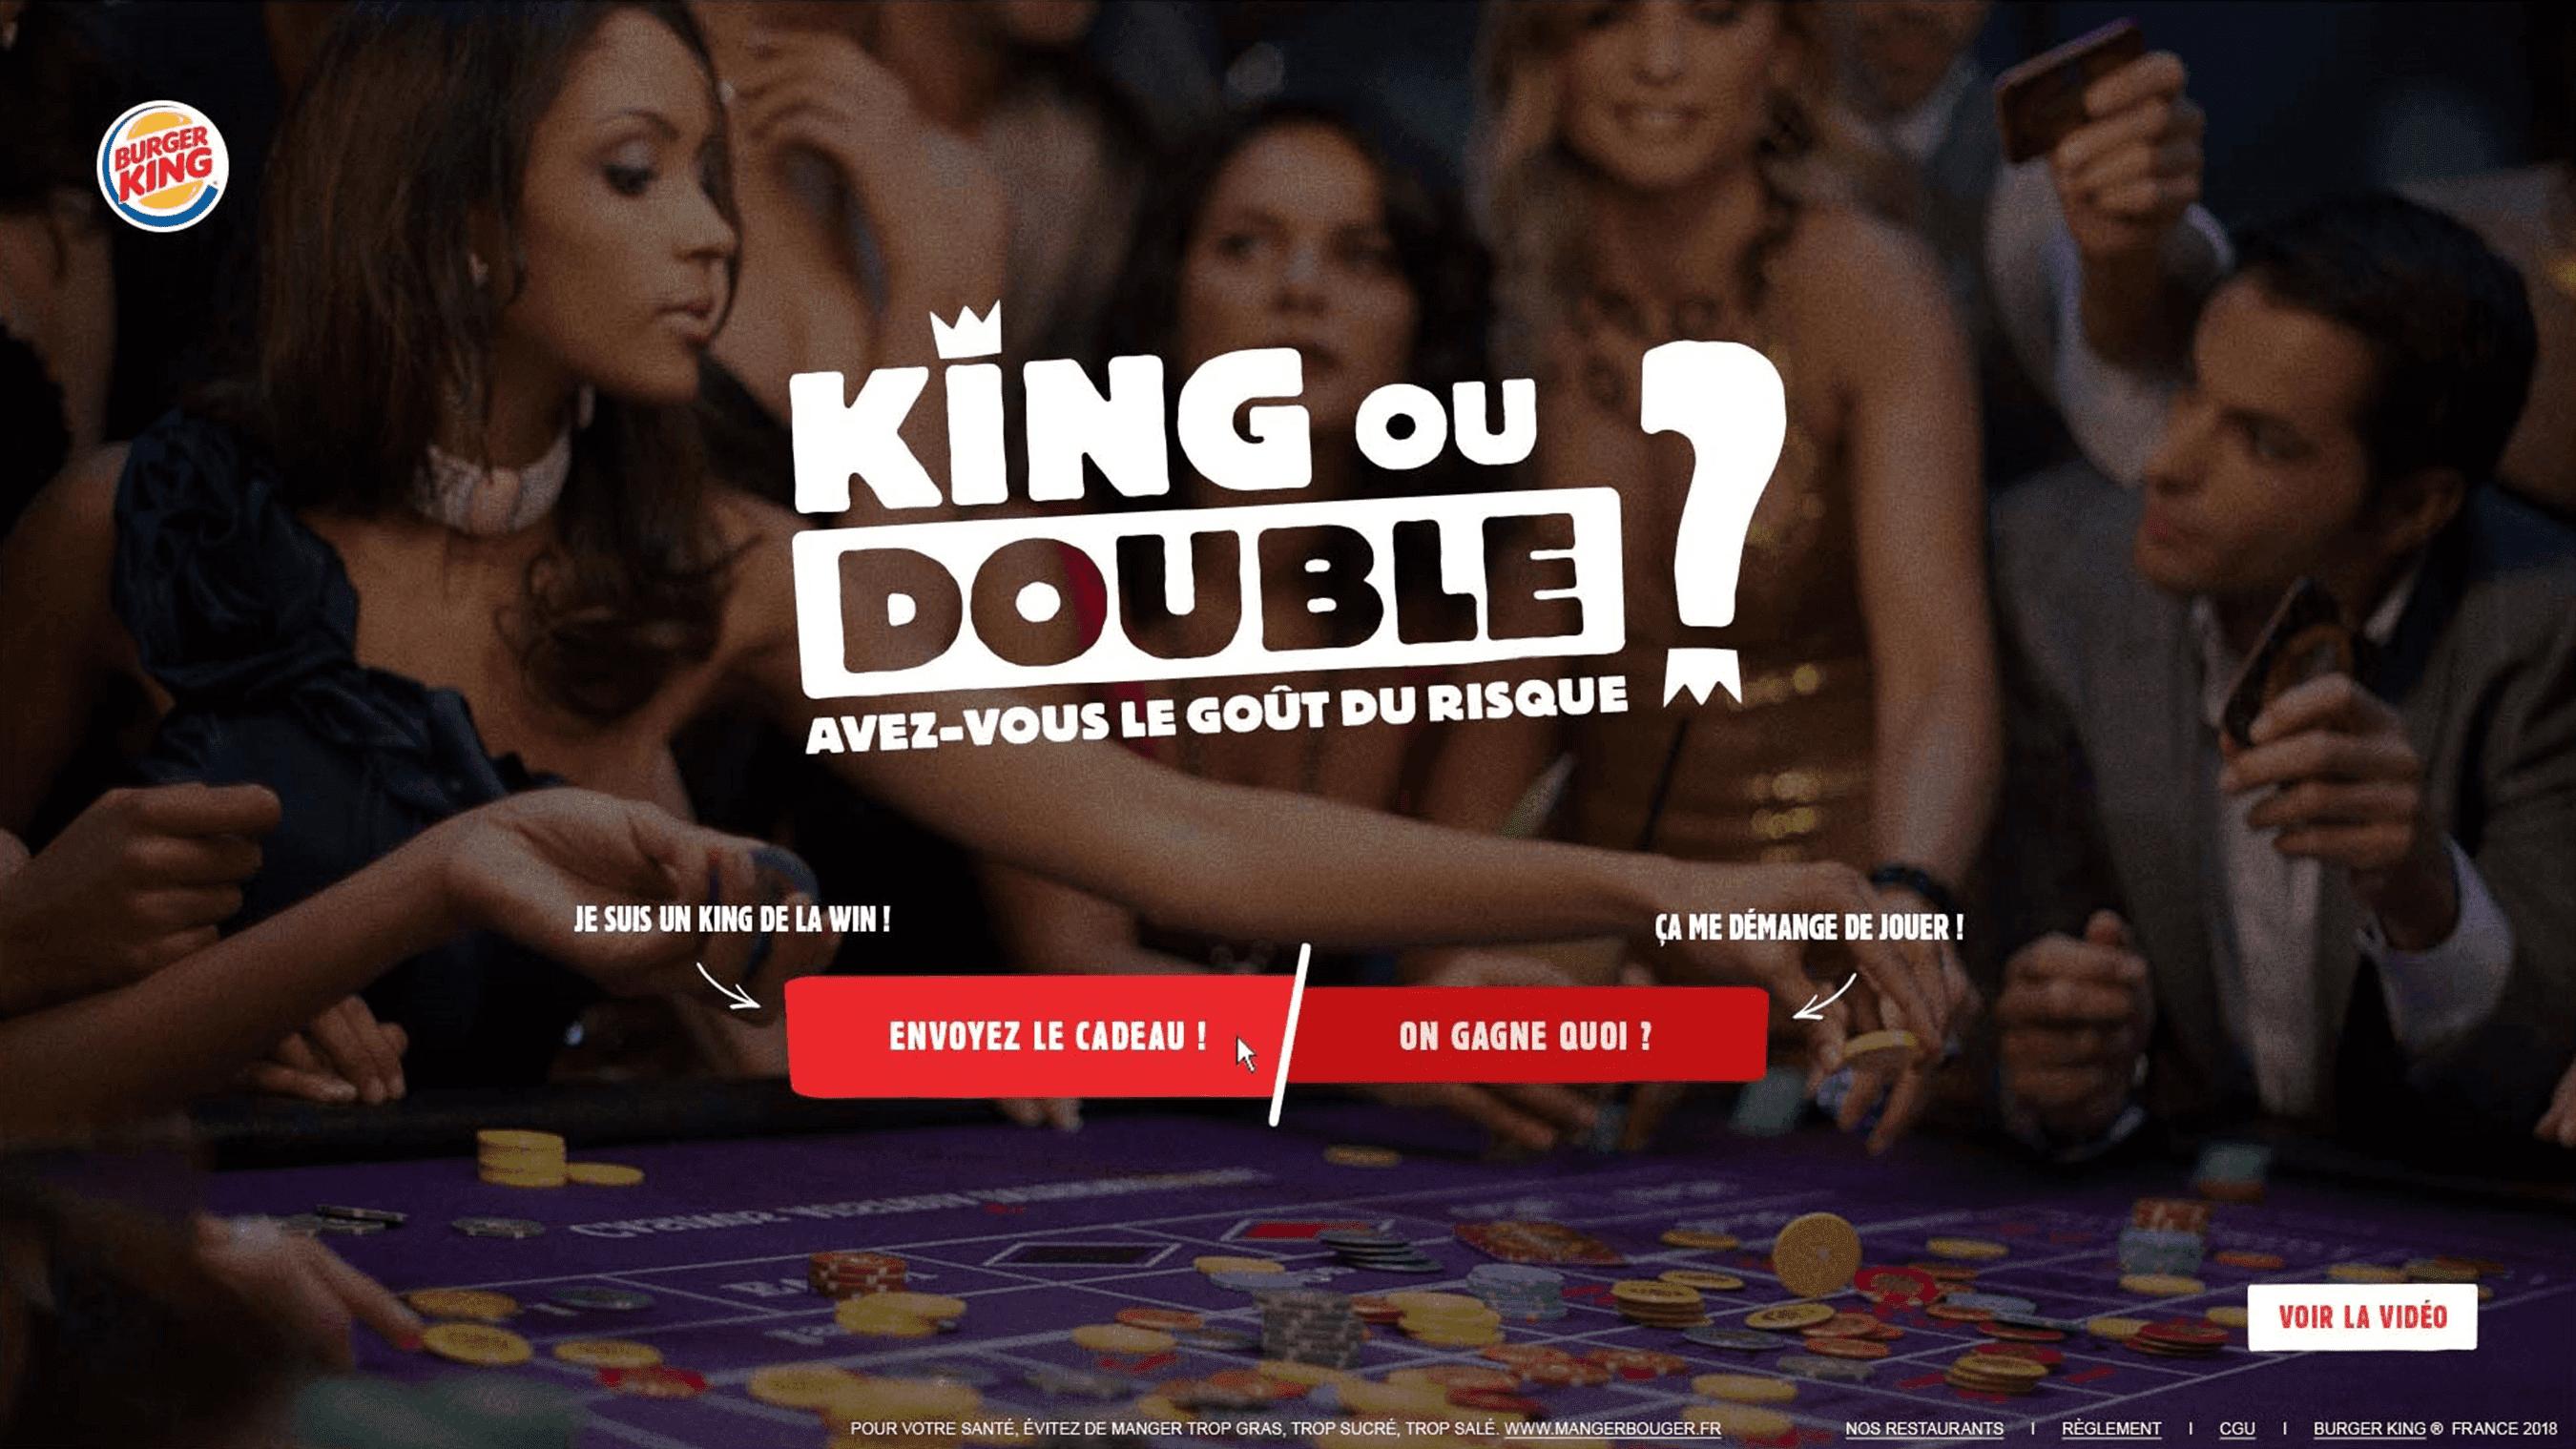 Burger King – King ou double accueil